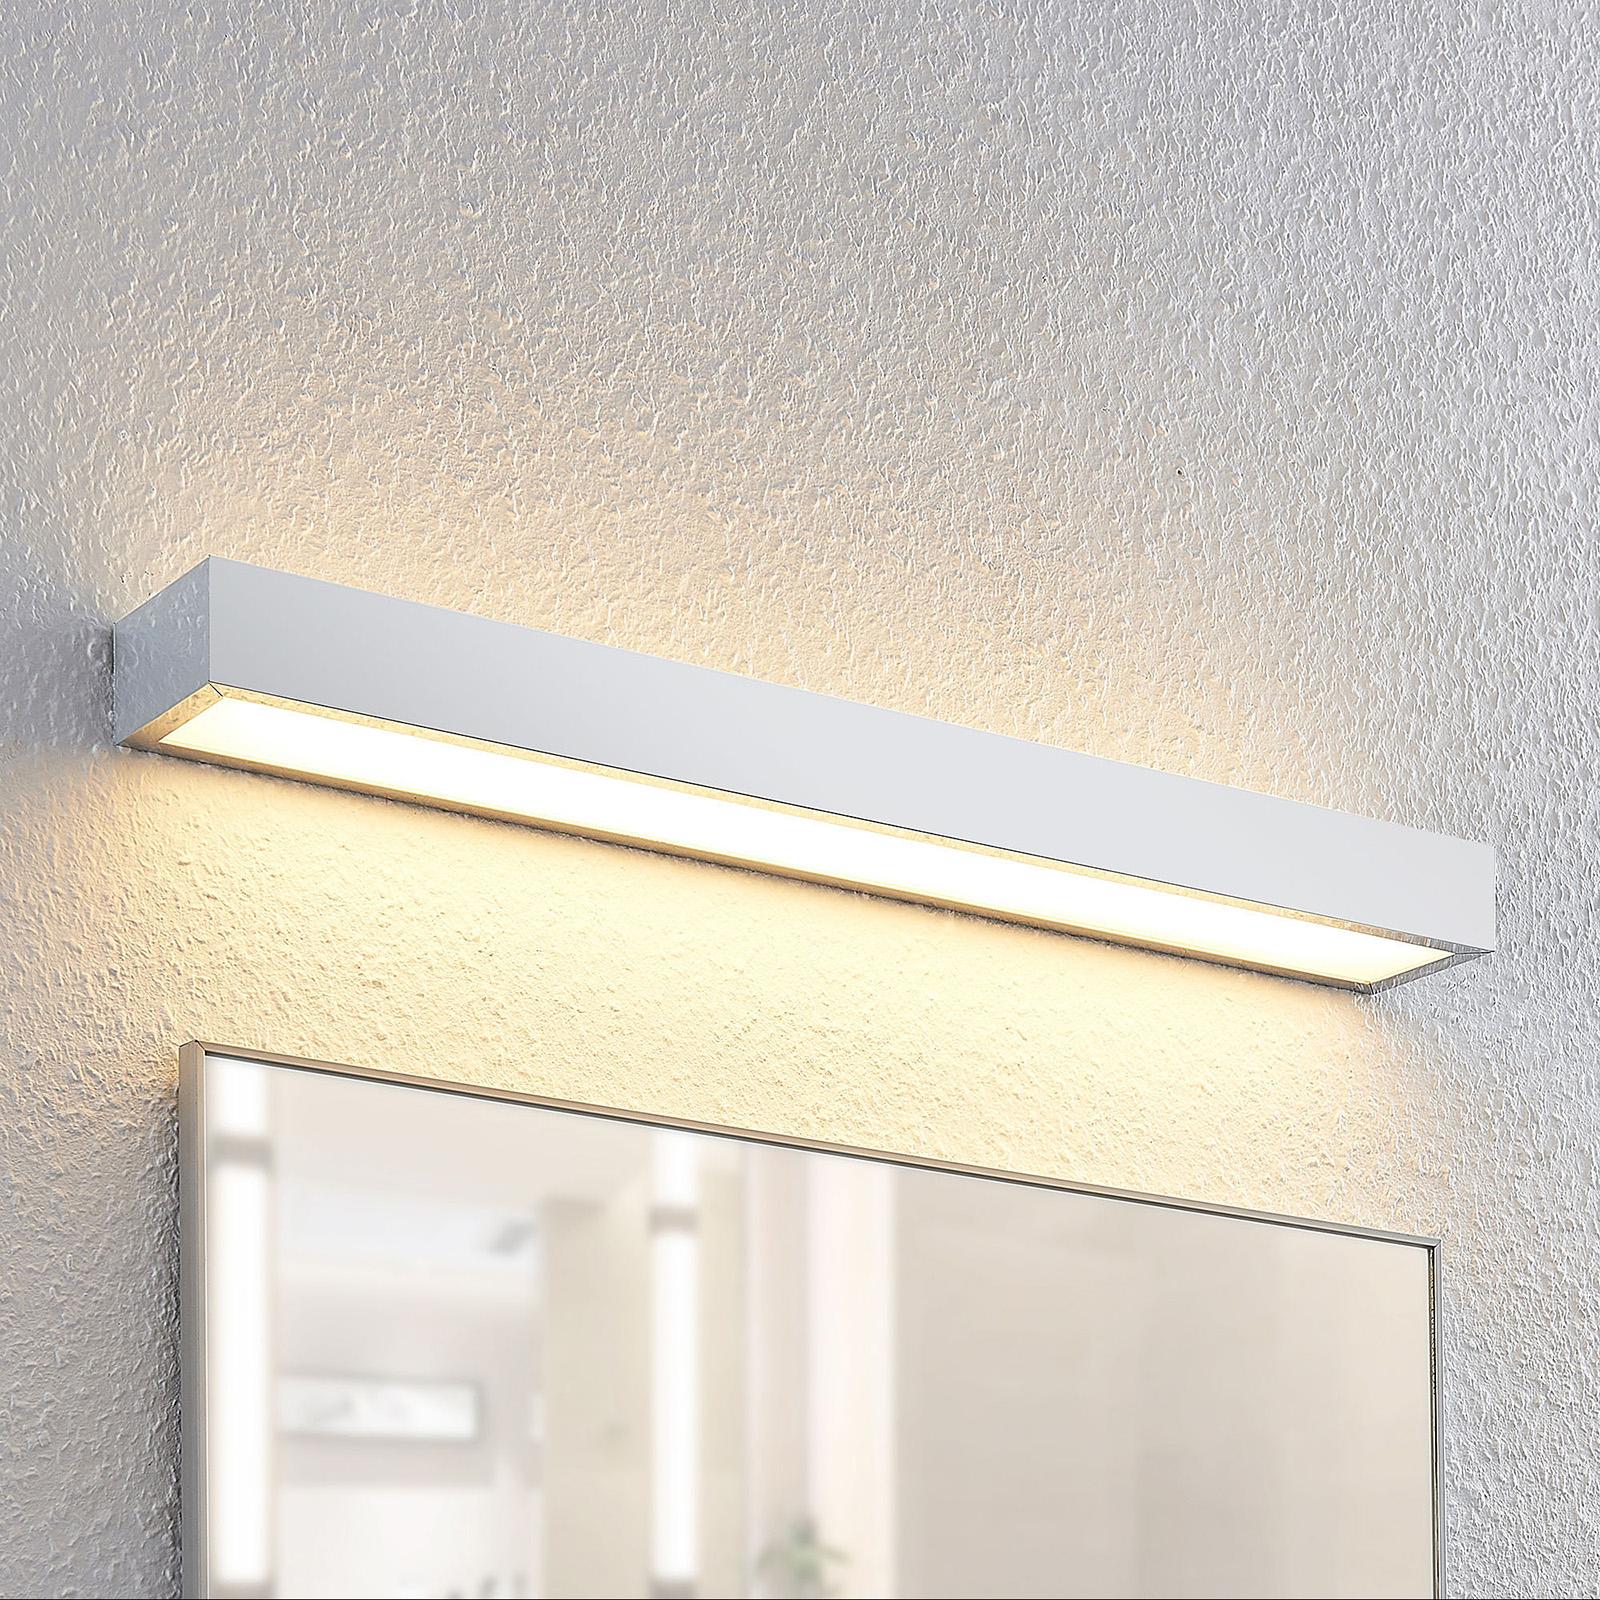 Lindby Layan applique LED per il bagno cromo 60 cm